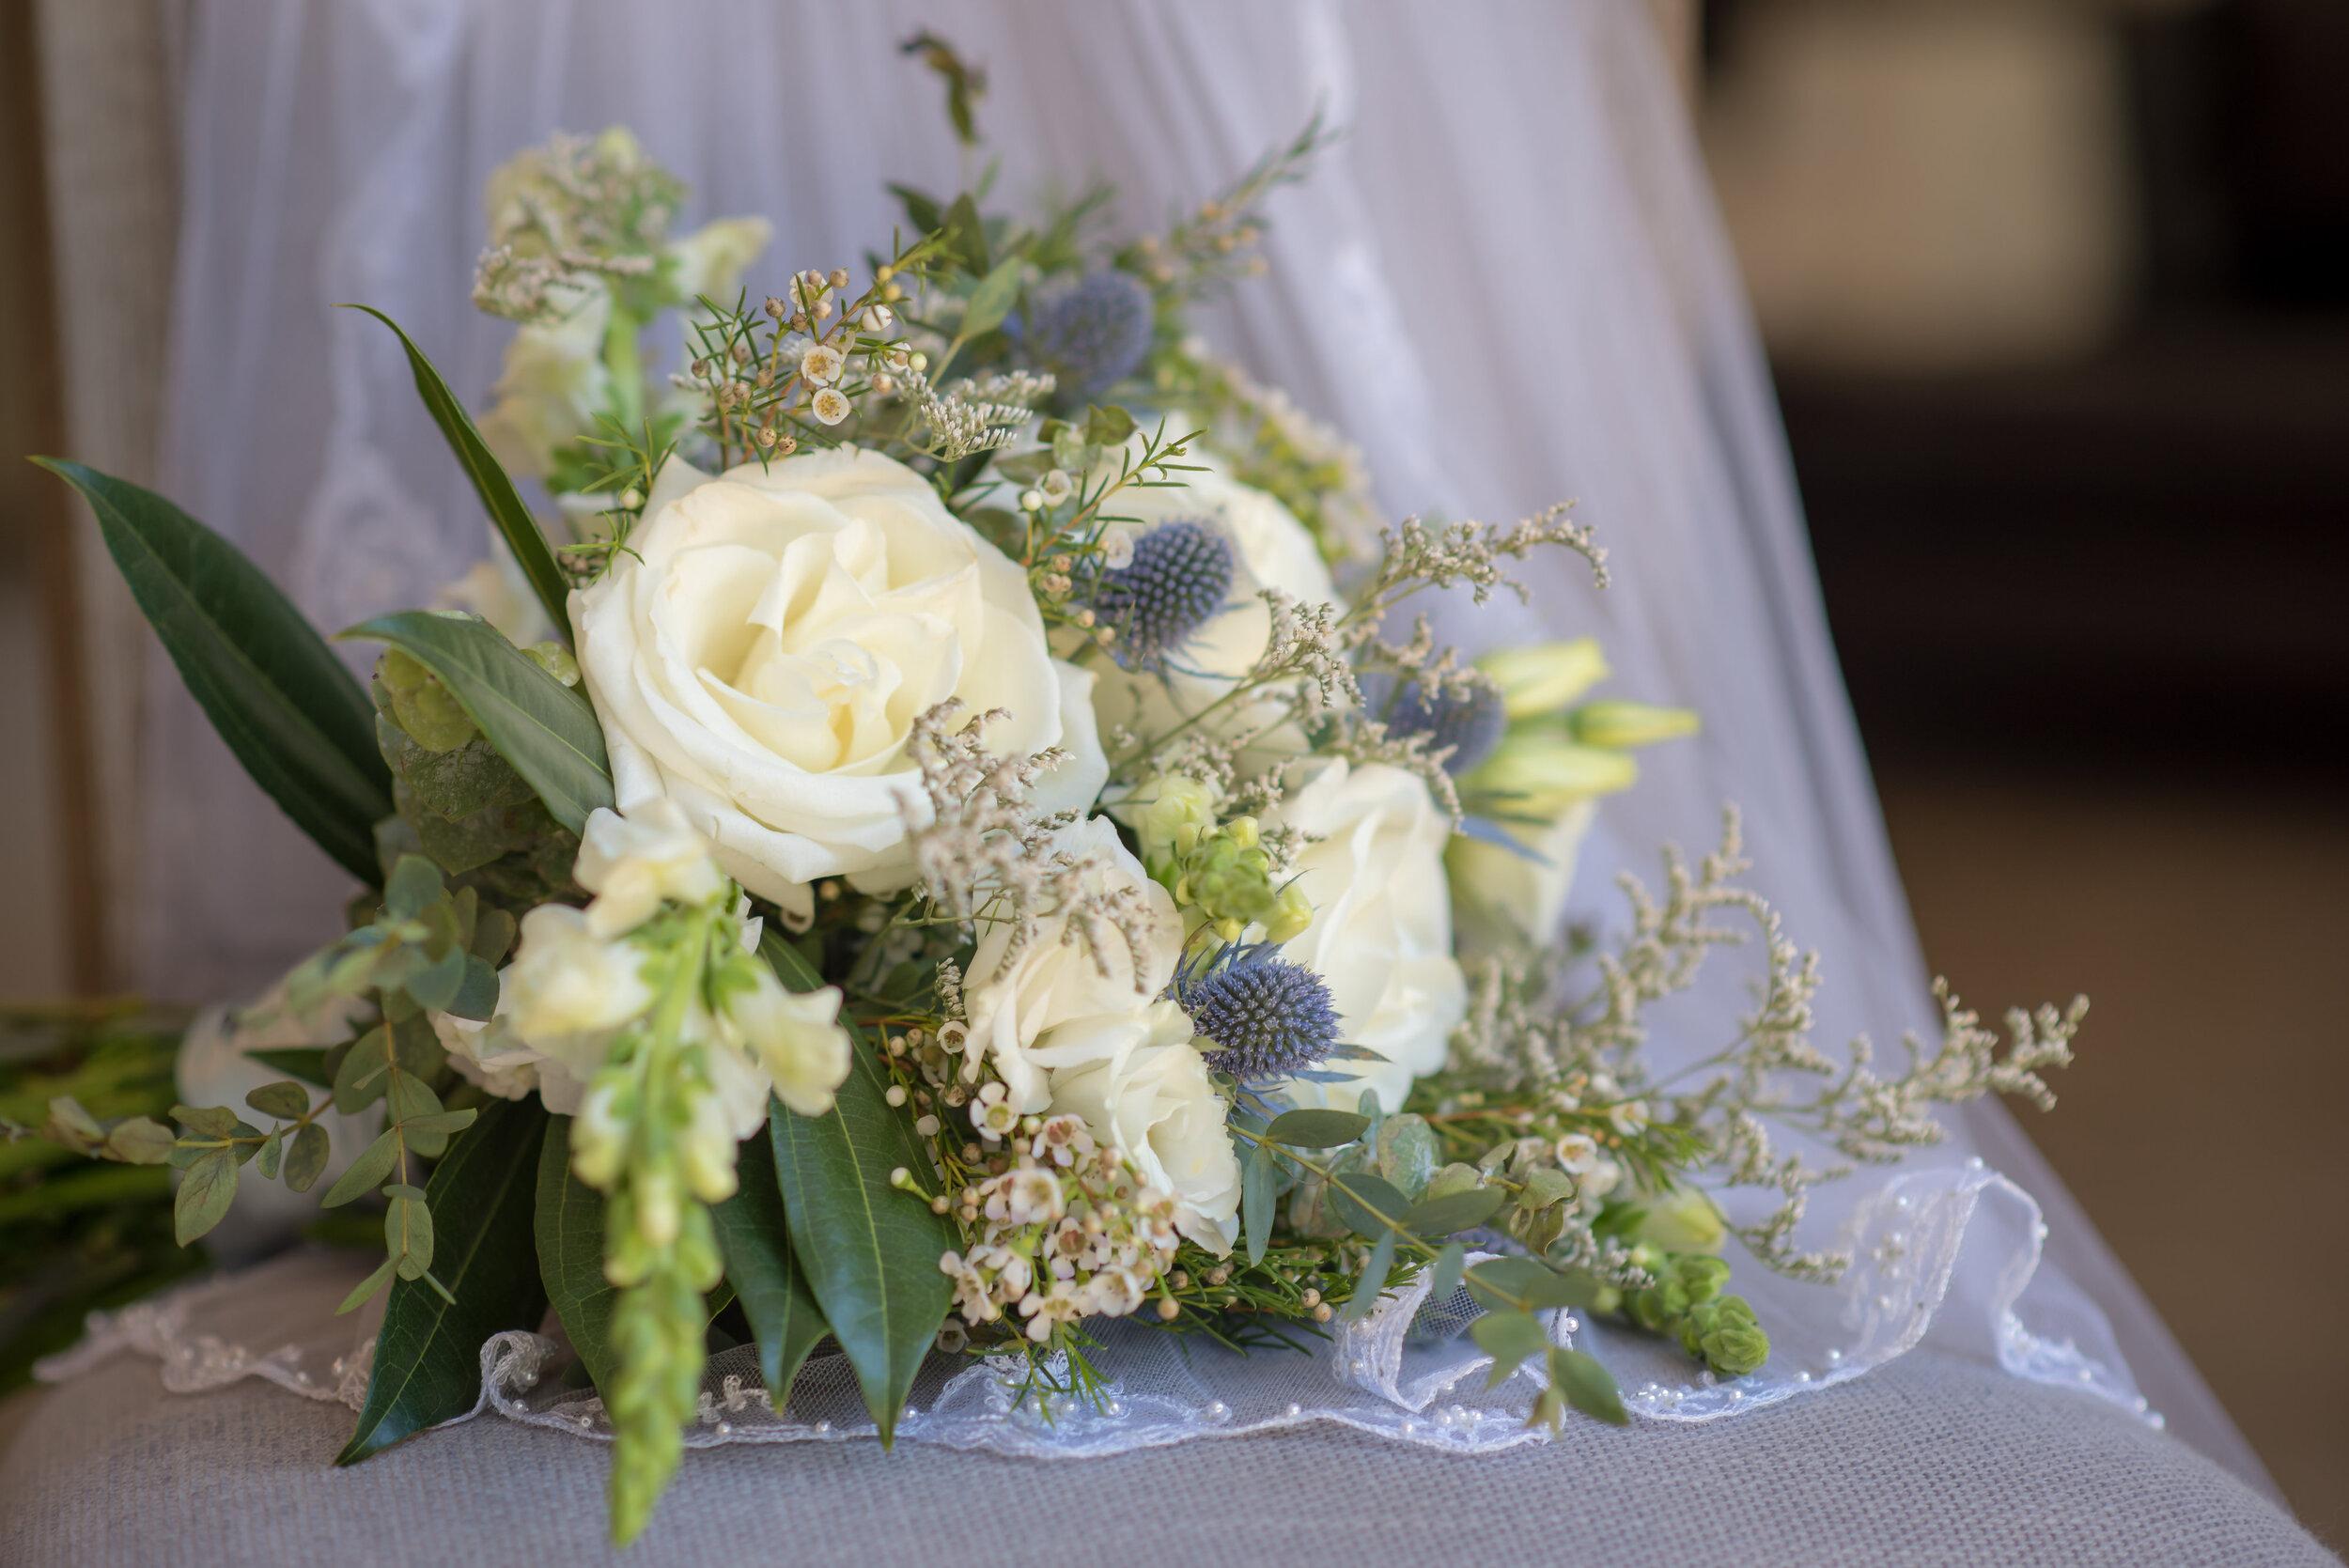 PHOTOGRAPHER: Adrea Thomas Photography -- www.adreathomas.com -- IG: adreathomasphoto  EVENT DESIGN & FLOWERS: Your Best Guest -- Hannah Guest -- www.yourbestguest.com -- IG & FB: @yourbestguest